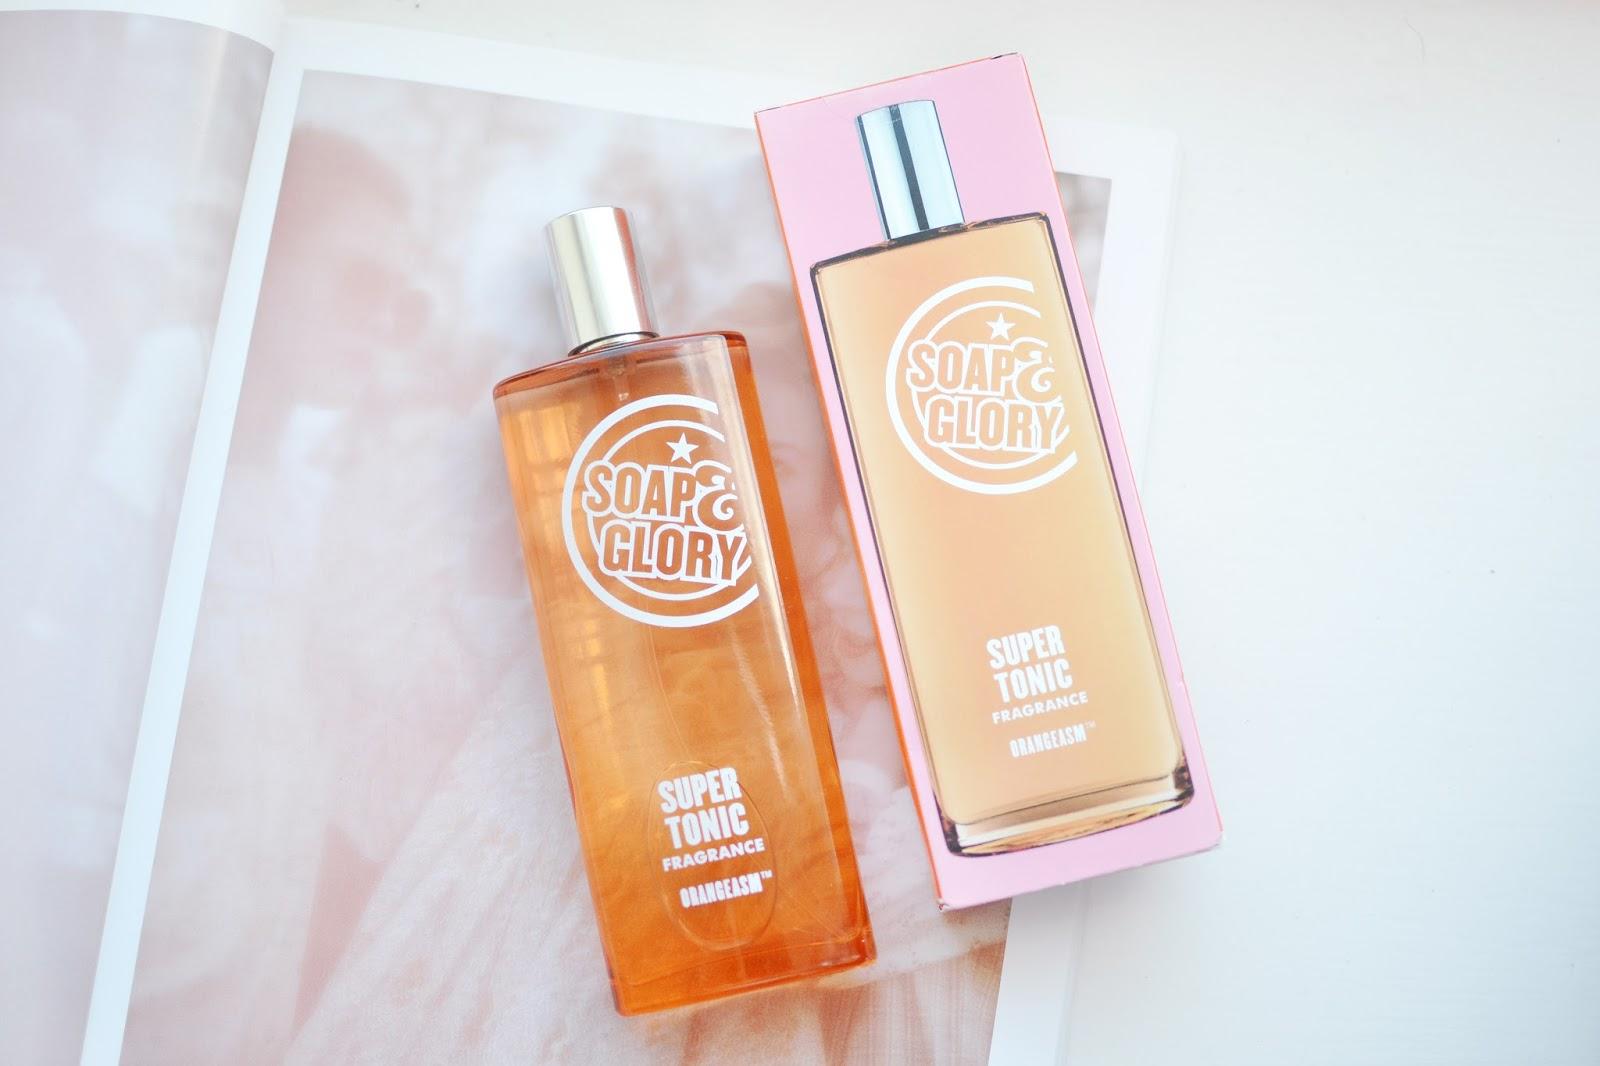 Soap&Glory ORANGEASM super tonic fragrance review